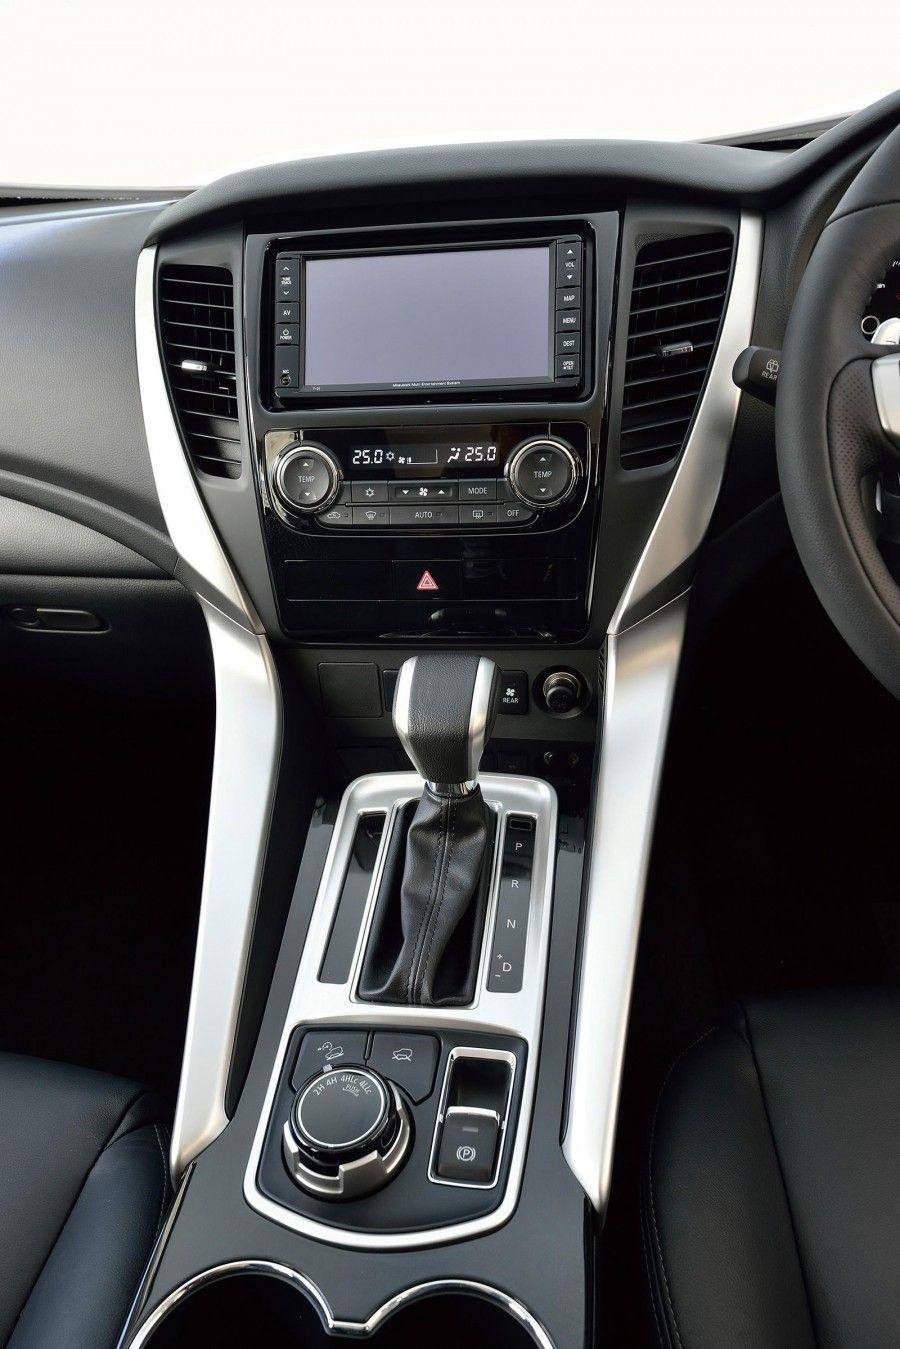 2016 Mitsubishi Pajero Sport Officially Unveiled